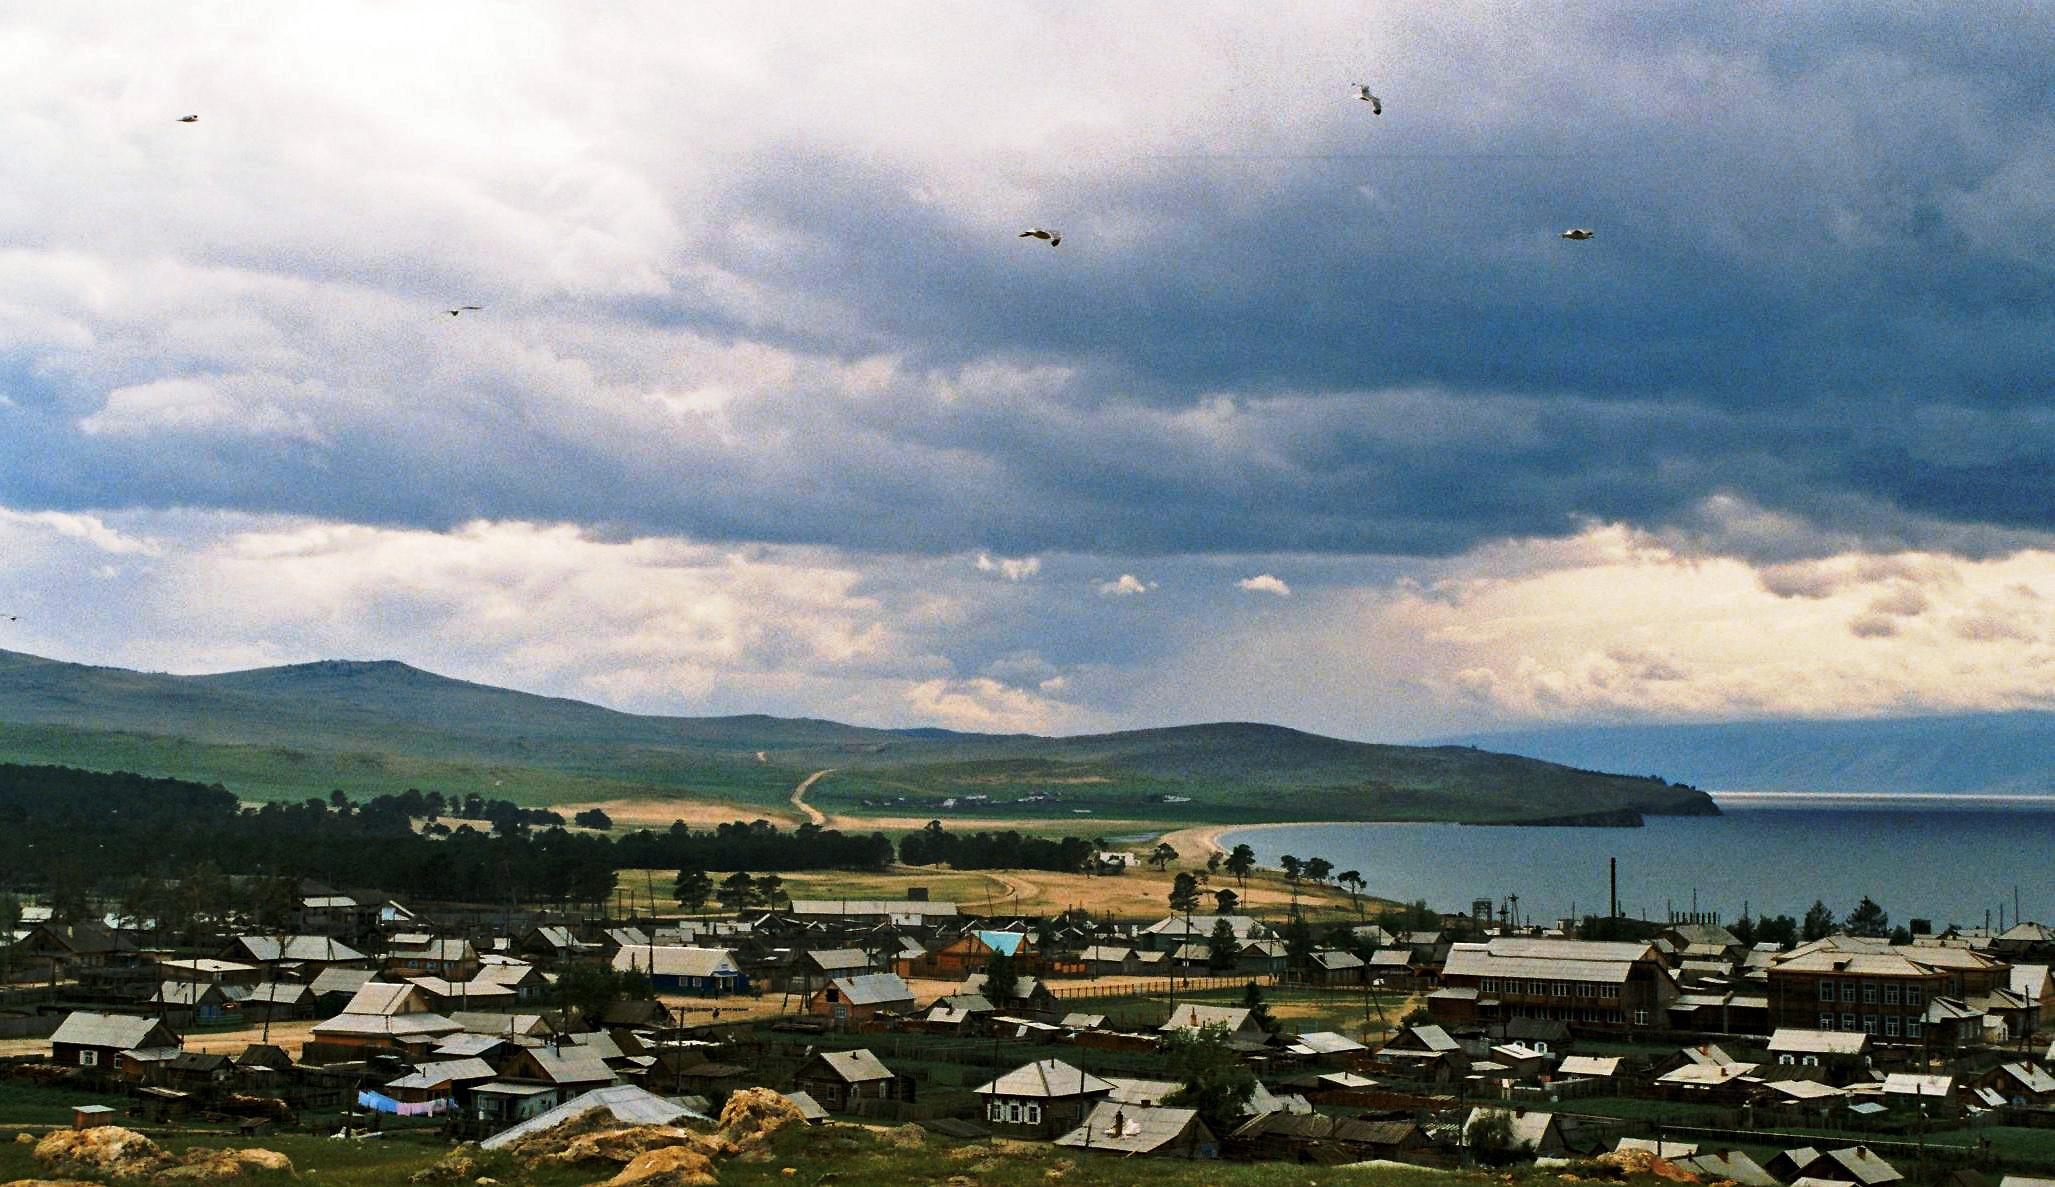 Le village de Khoujir - Village of Khoujir.jpg